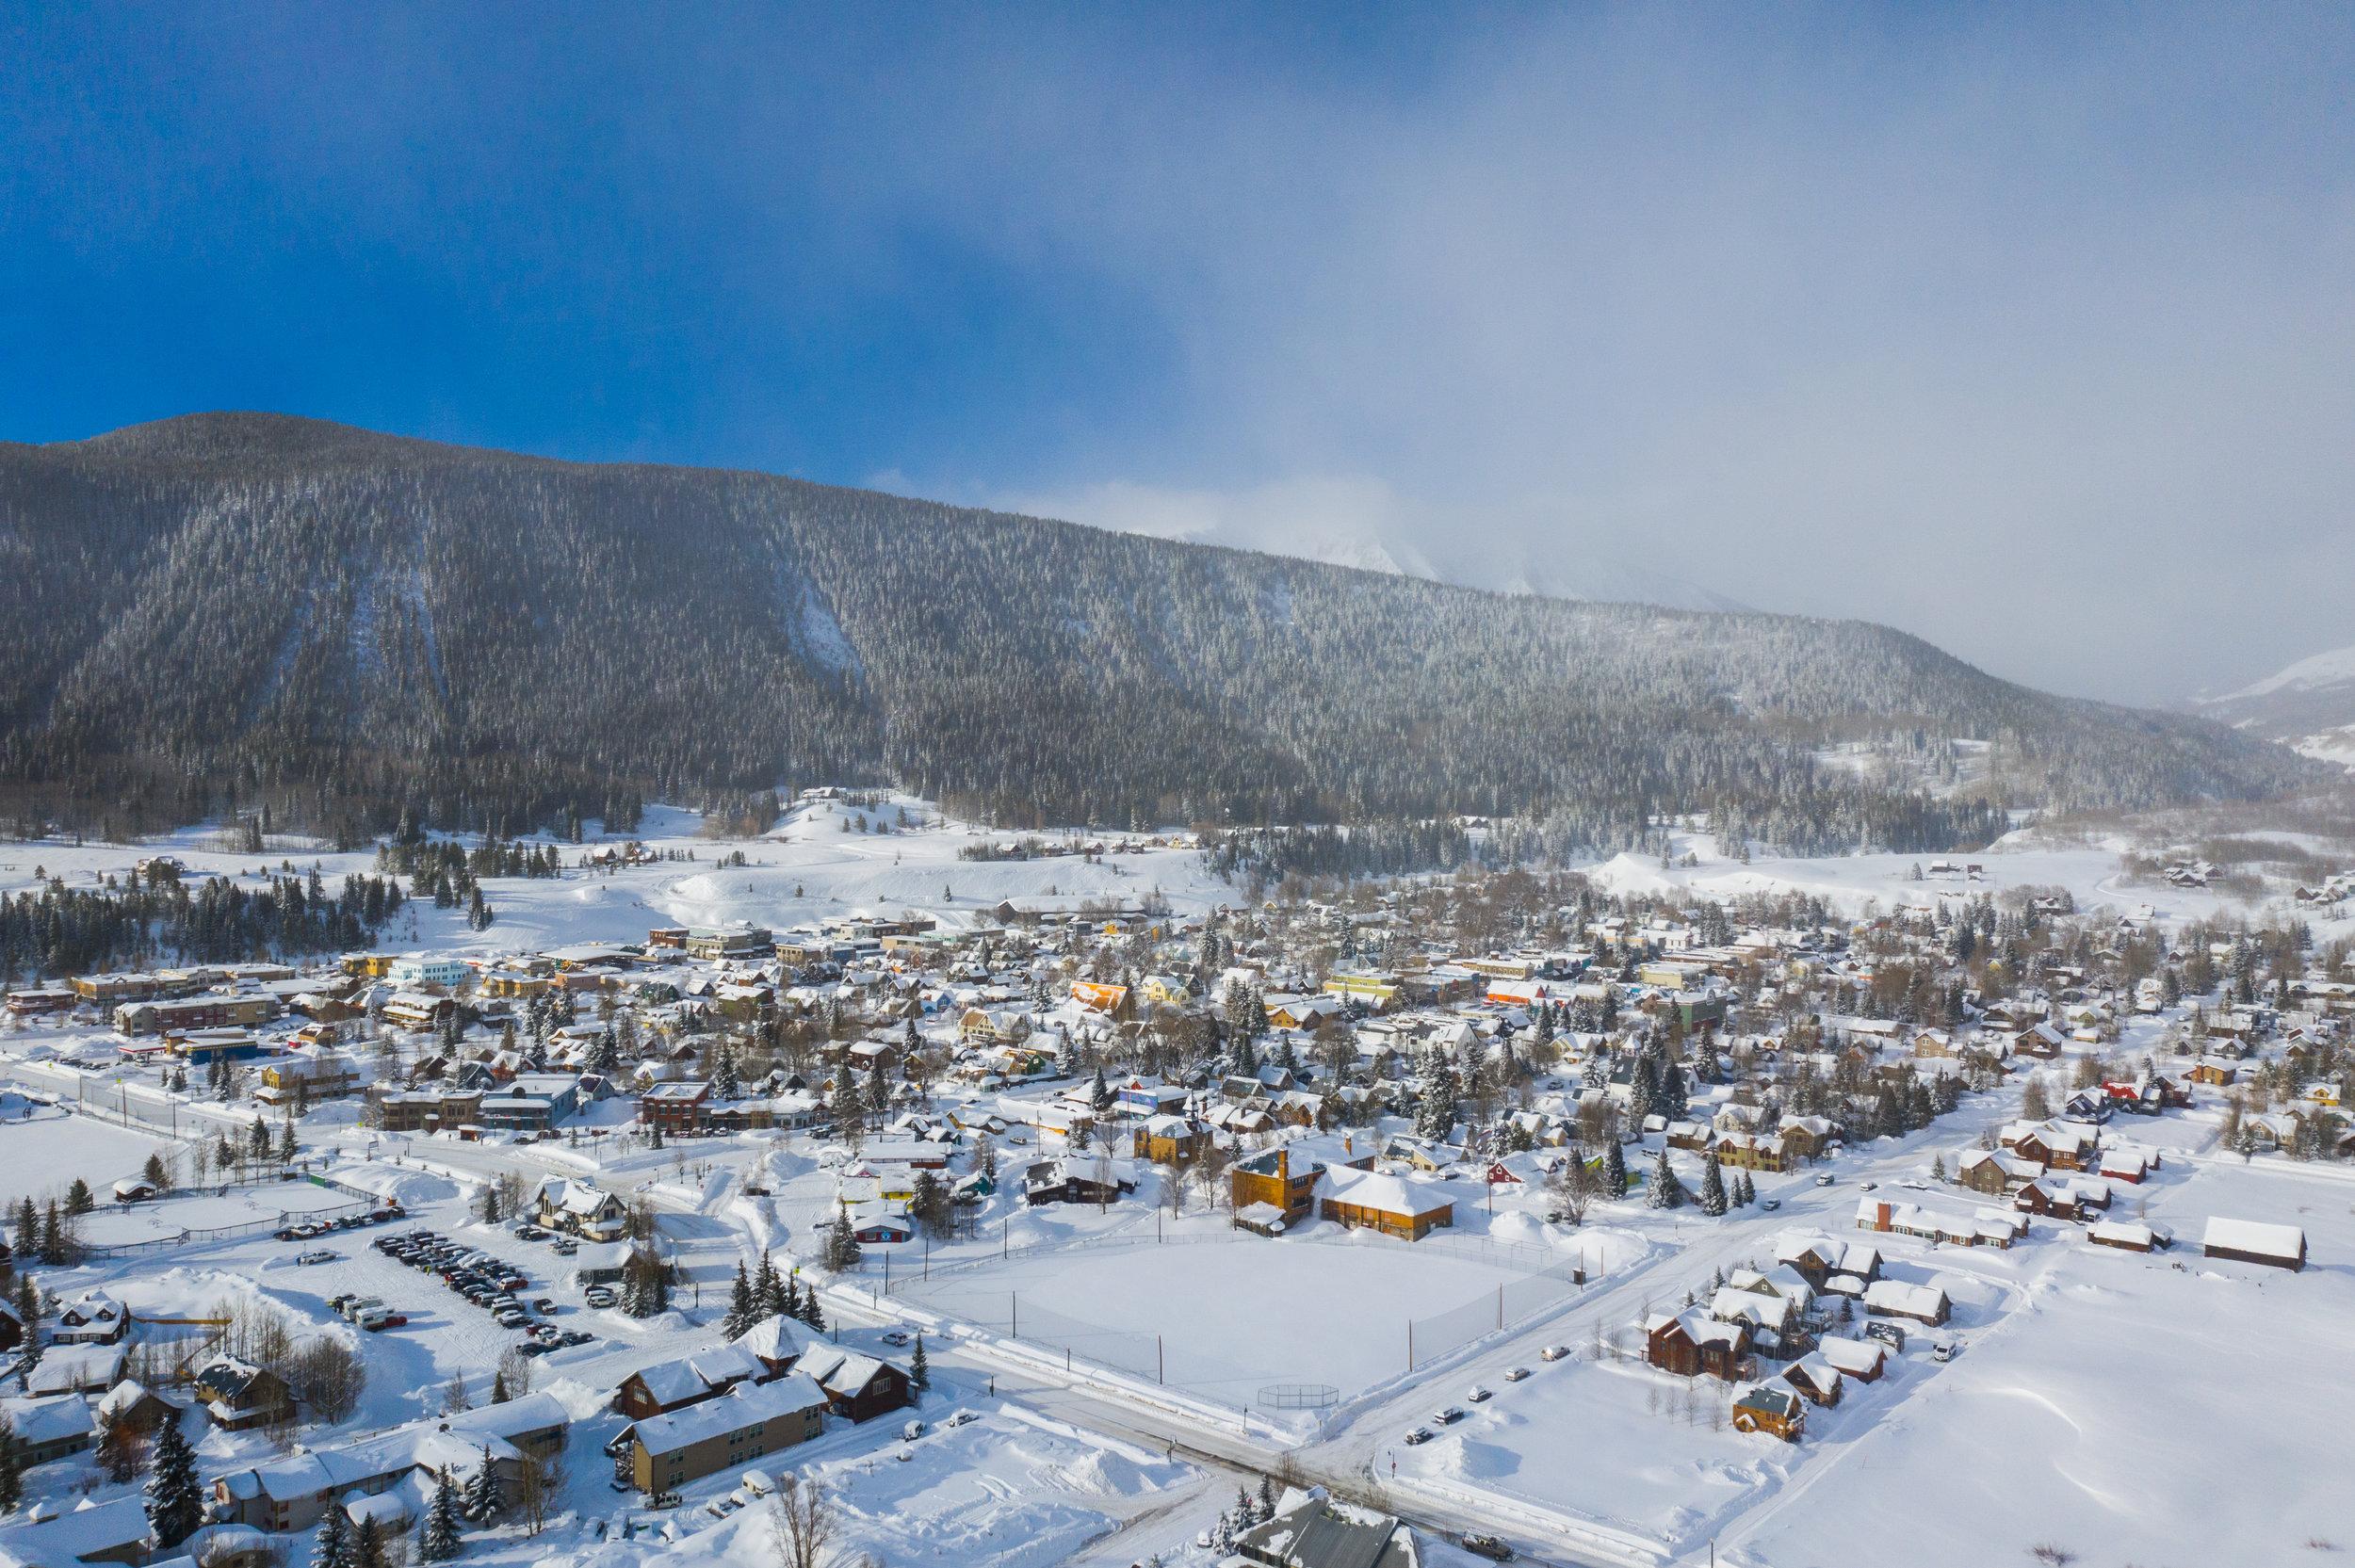 Town_Snow-0530.jpg